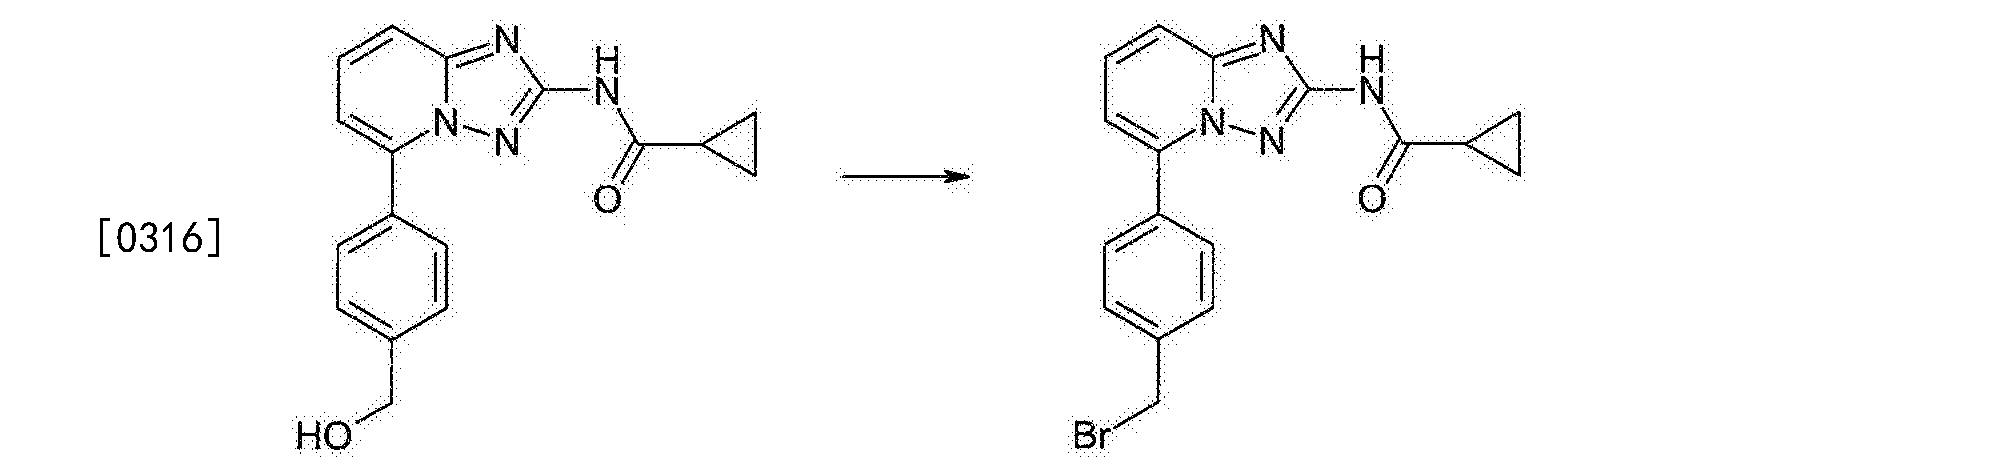 Figure CN105960407AD00352